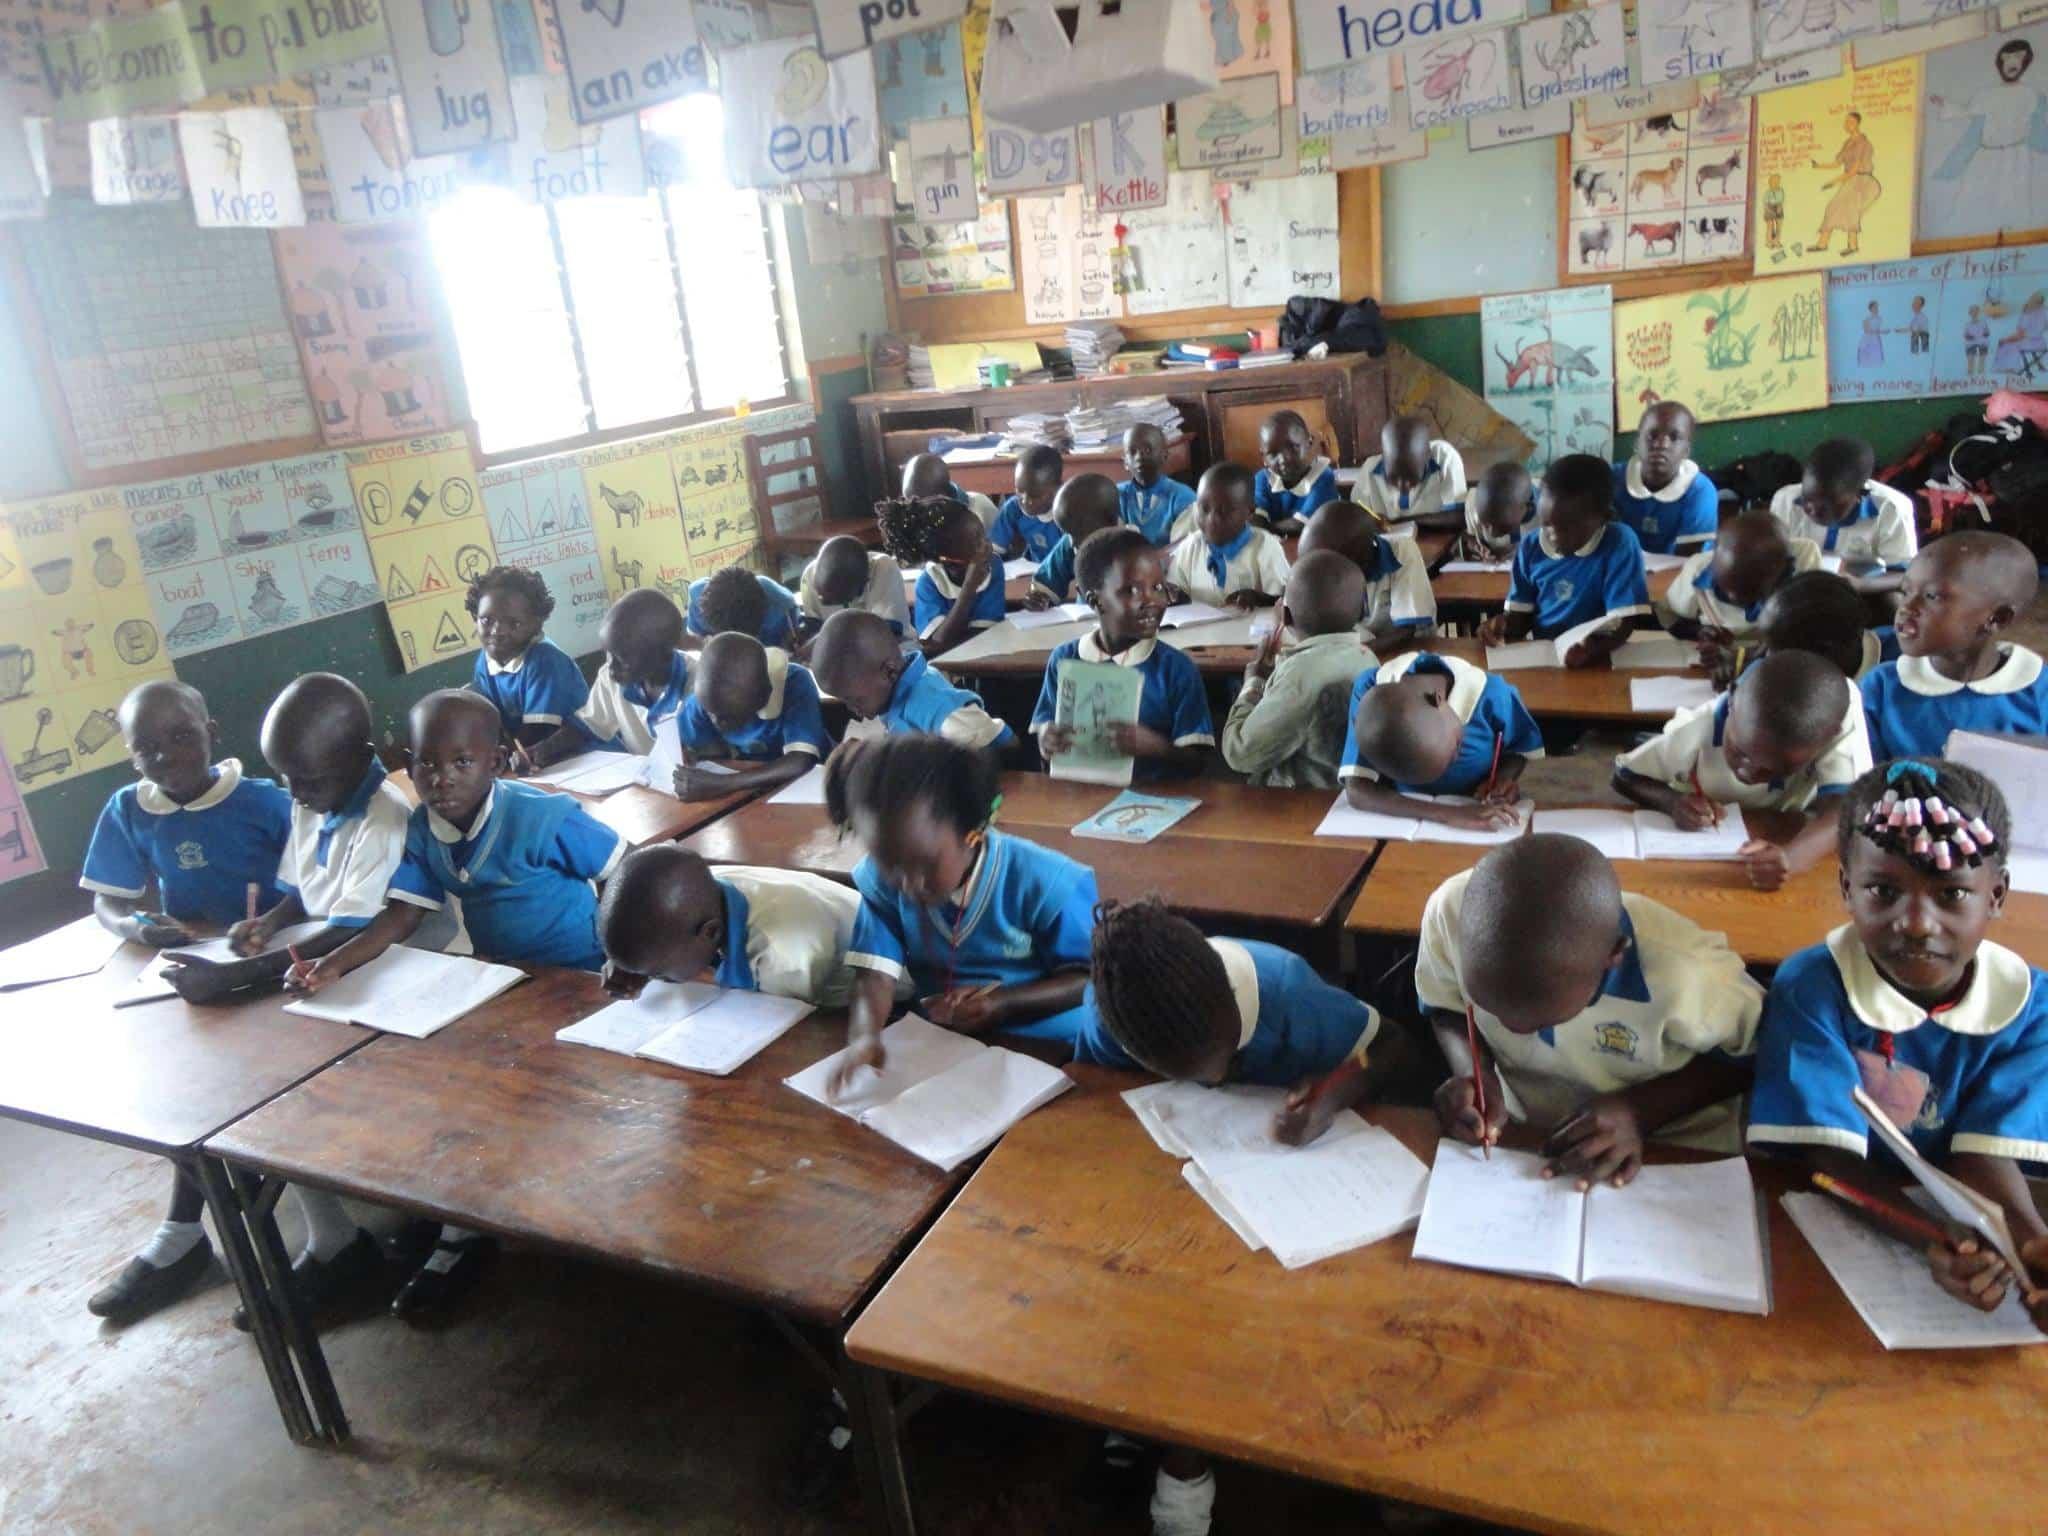 UGANDA: ESHO Primary School designed by Francesco Stumpo, sponsorship available